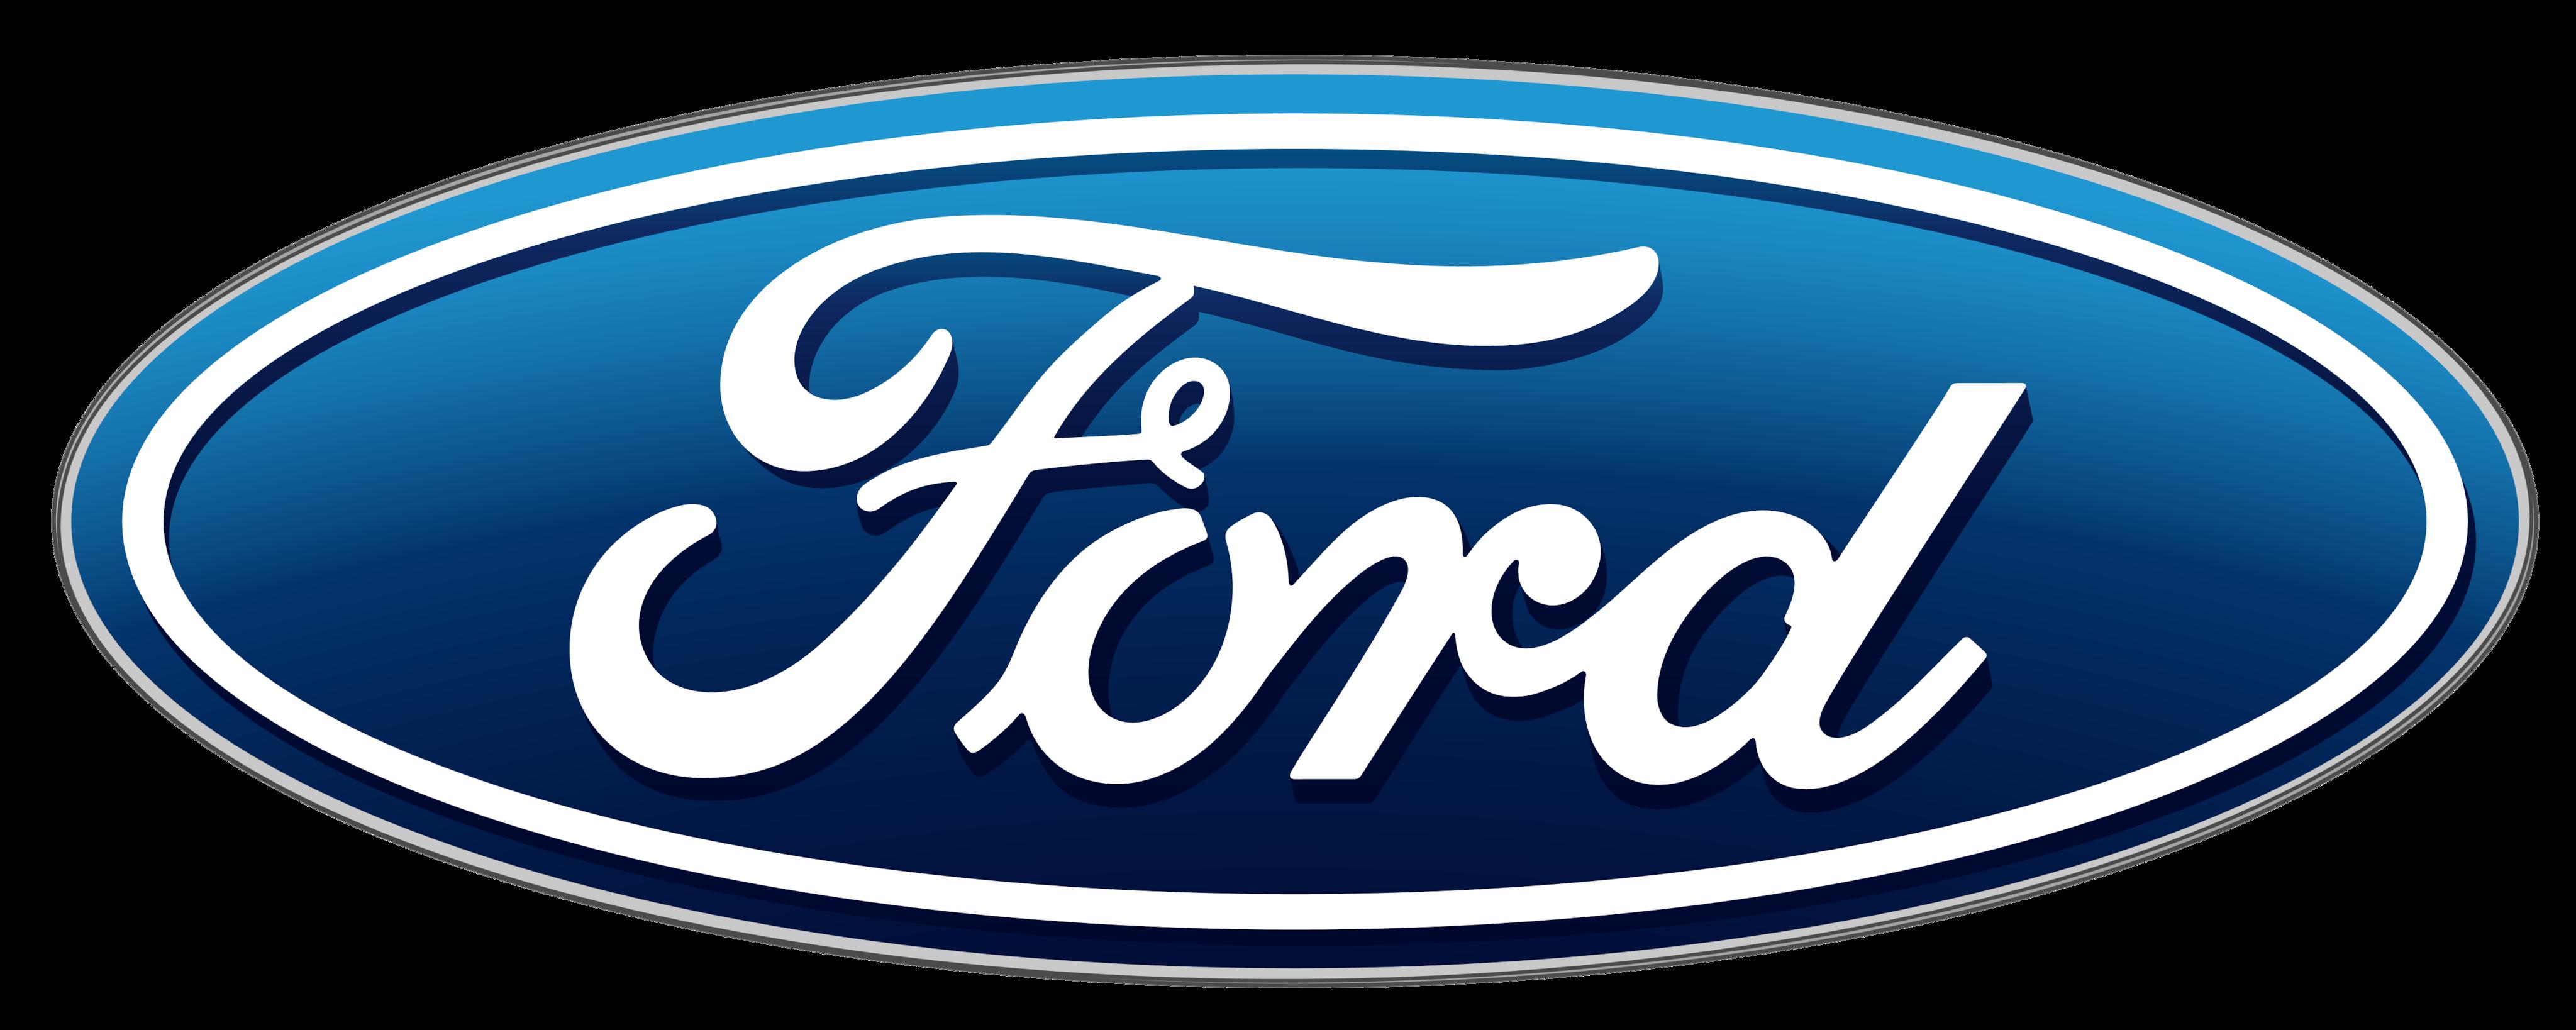 Lincoln Car Logo History Www Miifotos Com